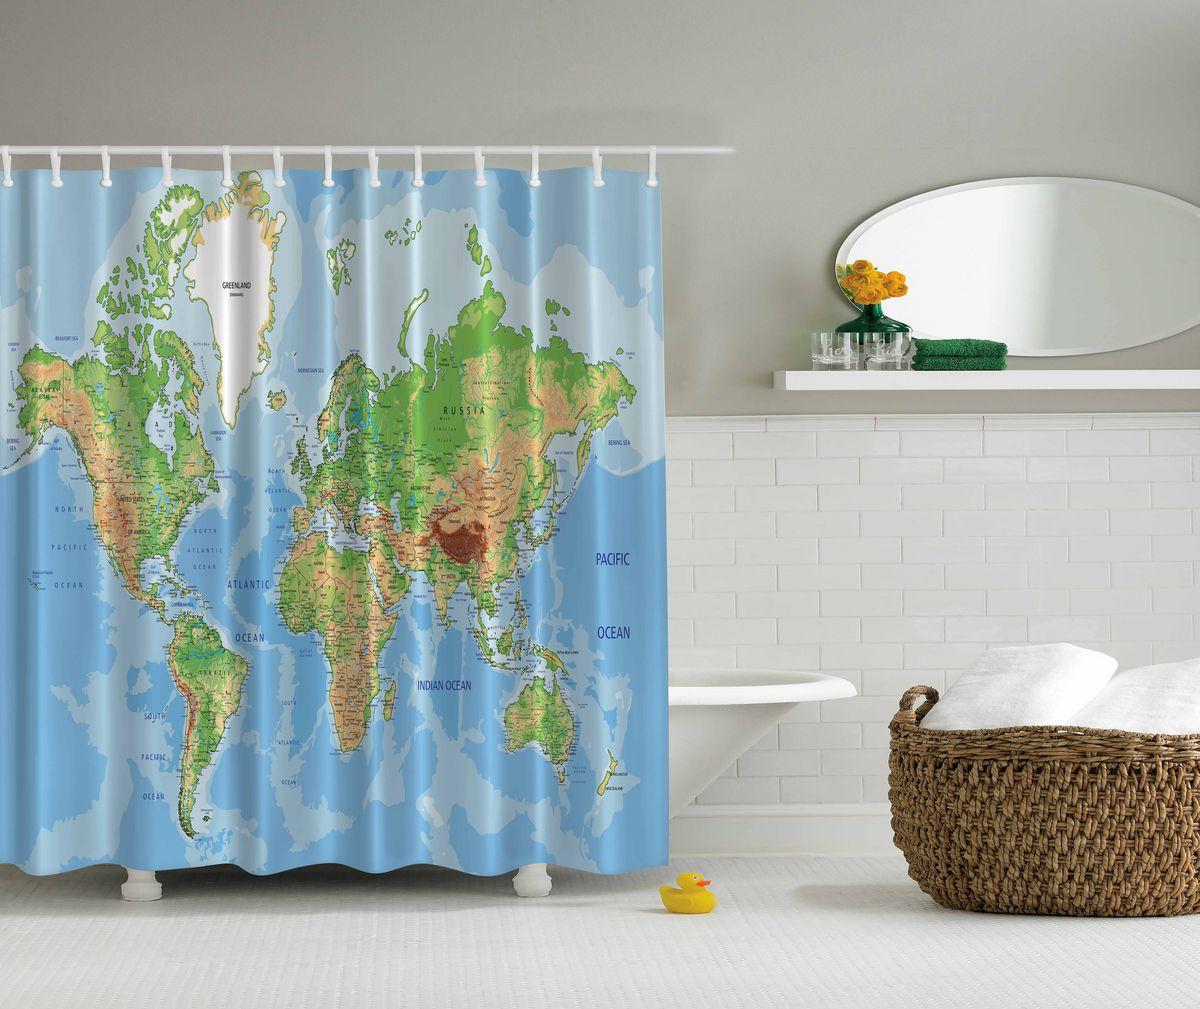 Штора для ванной комнаты Magic Lady Карта мира, 180 х 200 см. шв_4494